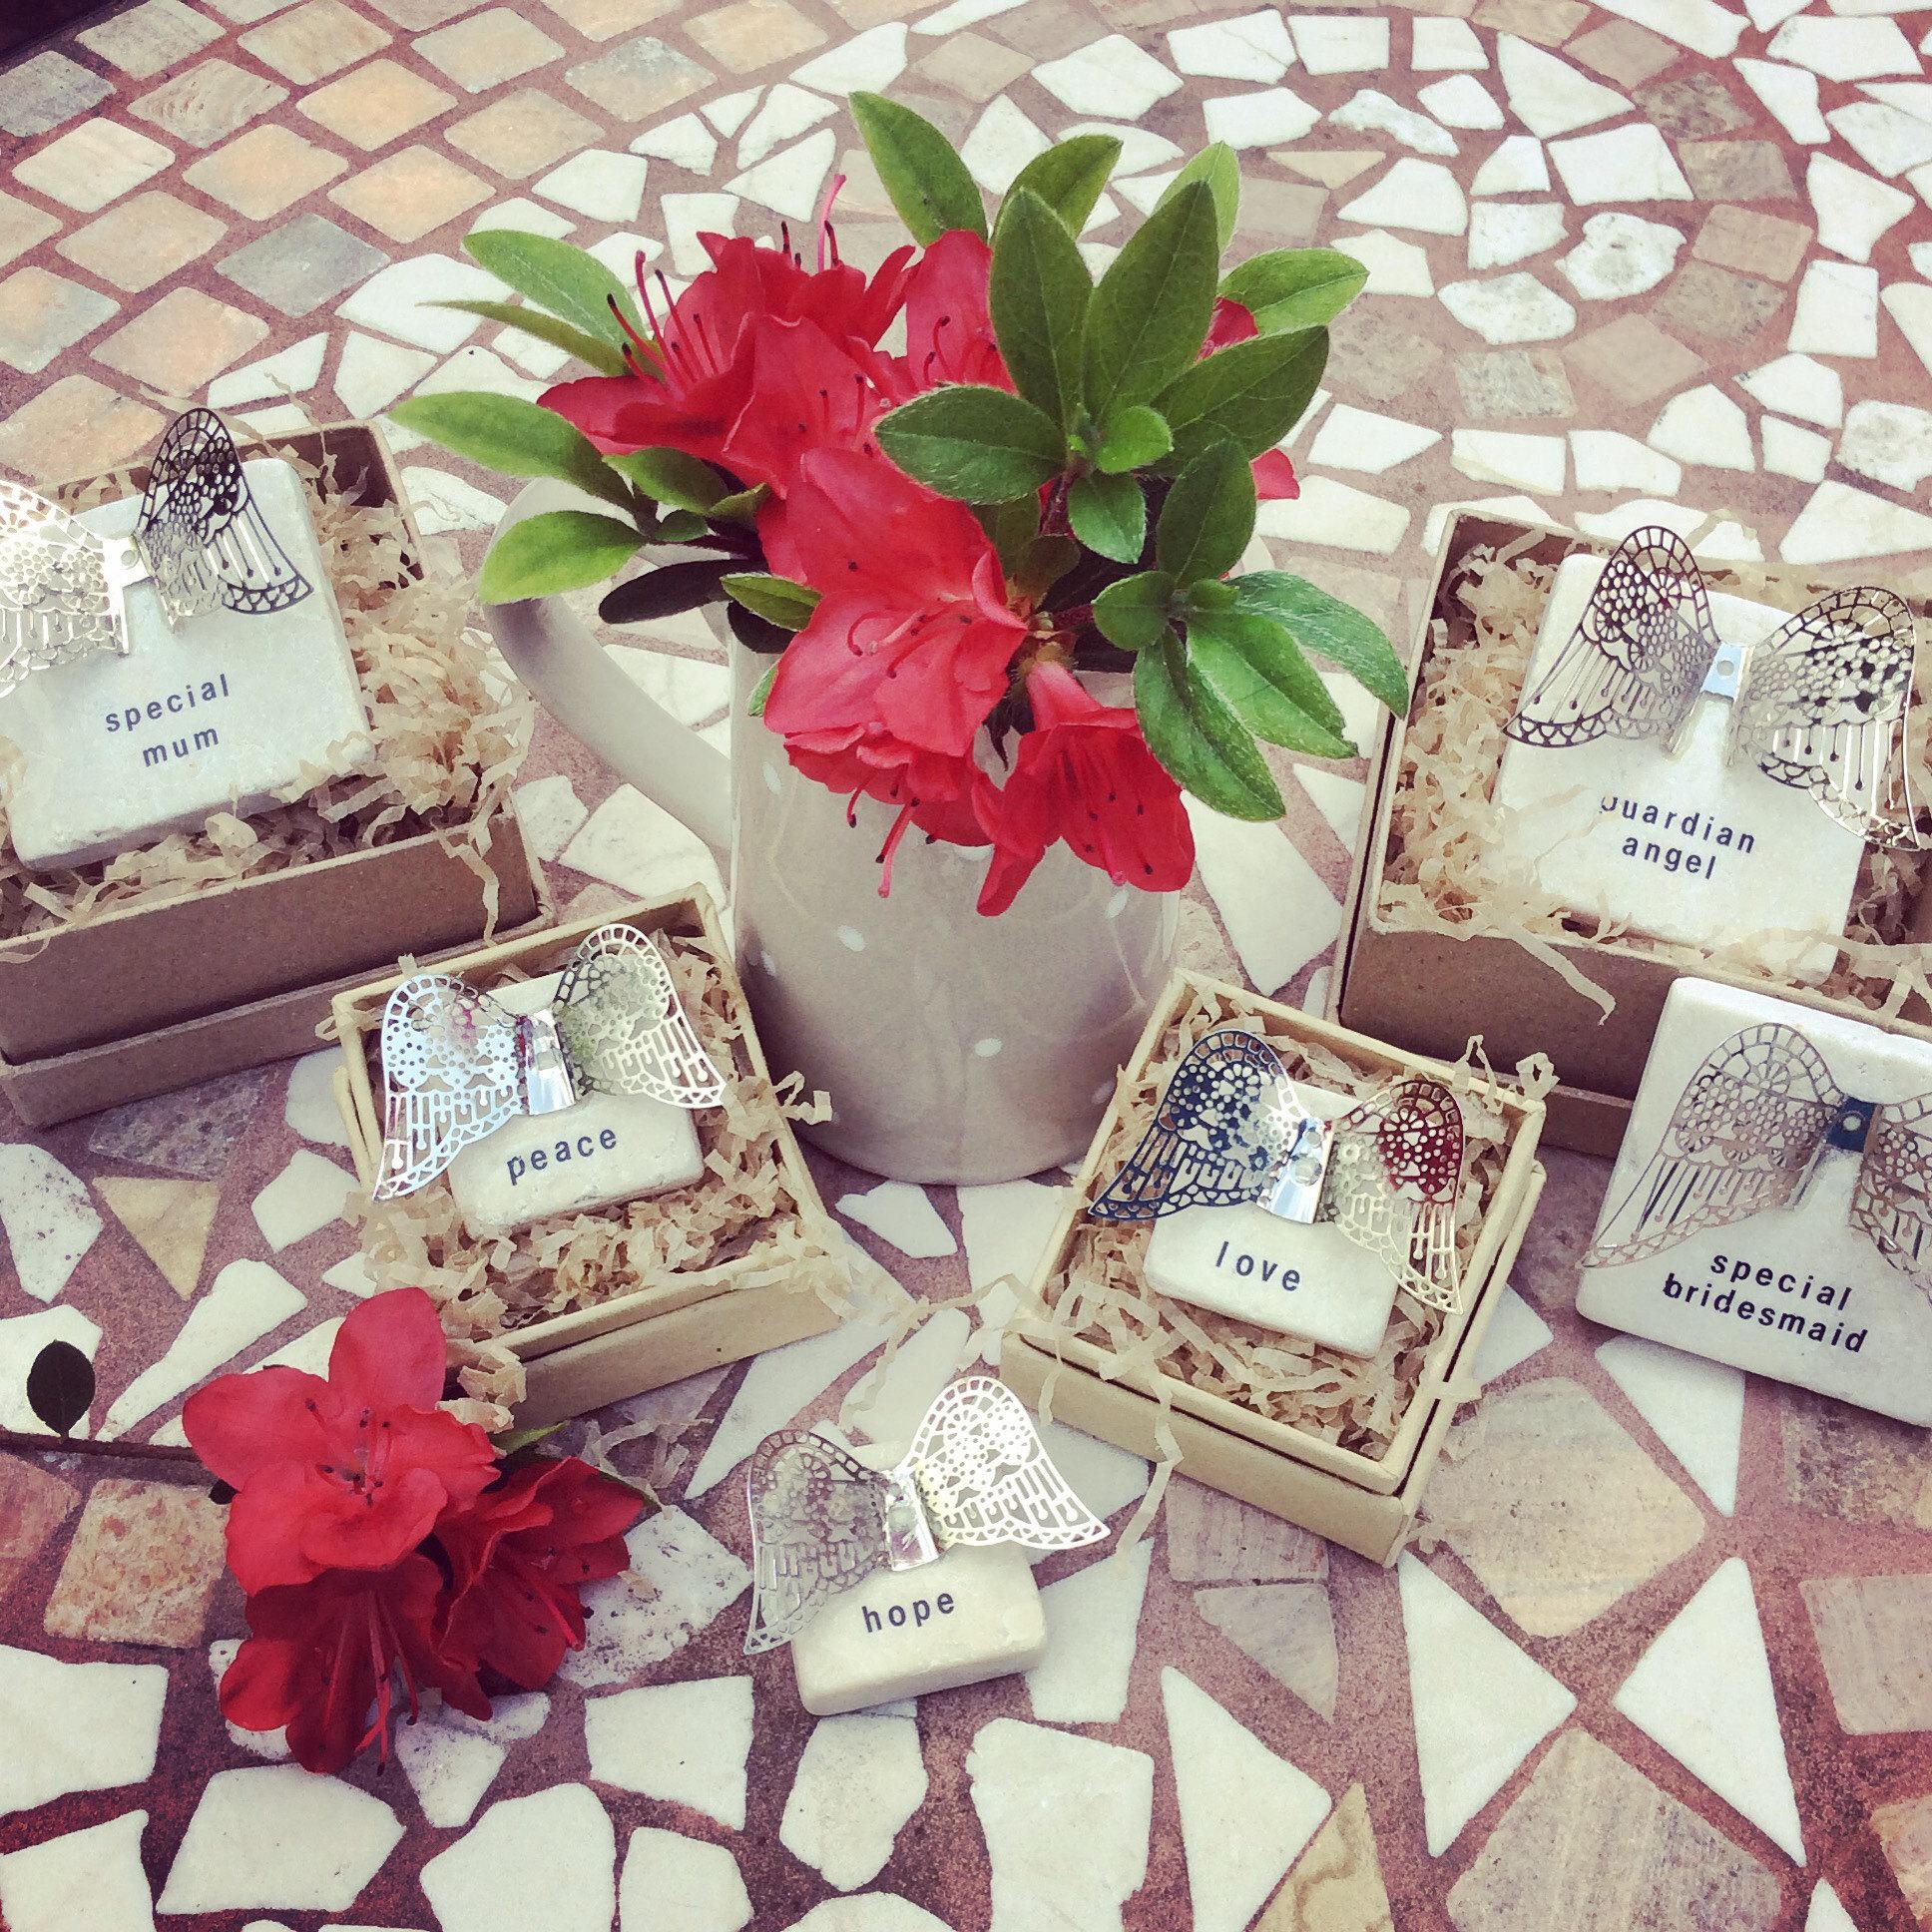 PepperDisco specialises in handcrafted gifts von PepperDisco